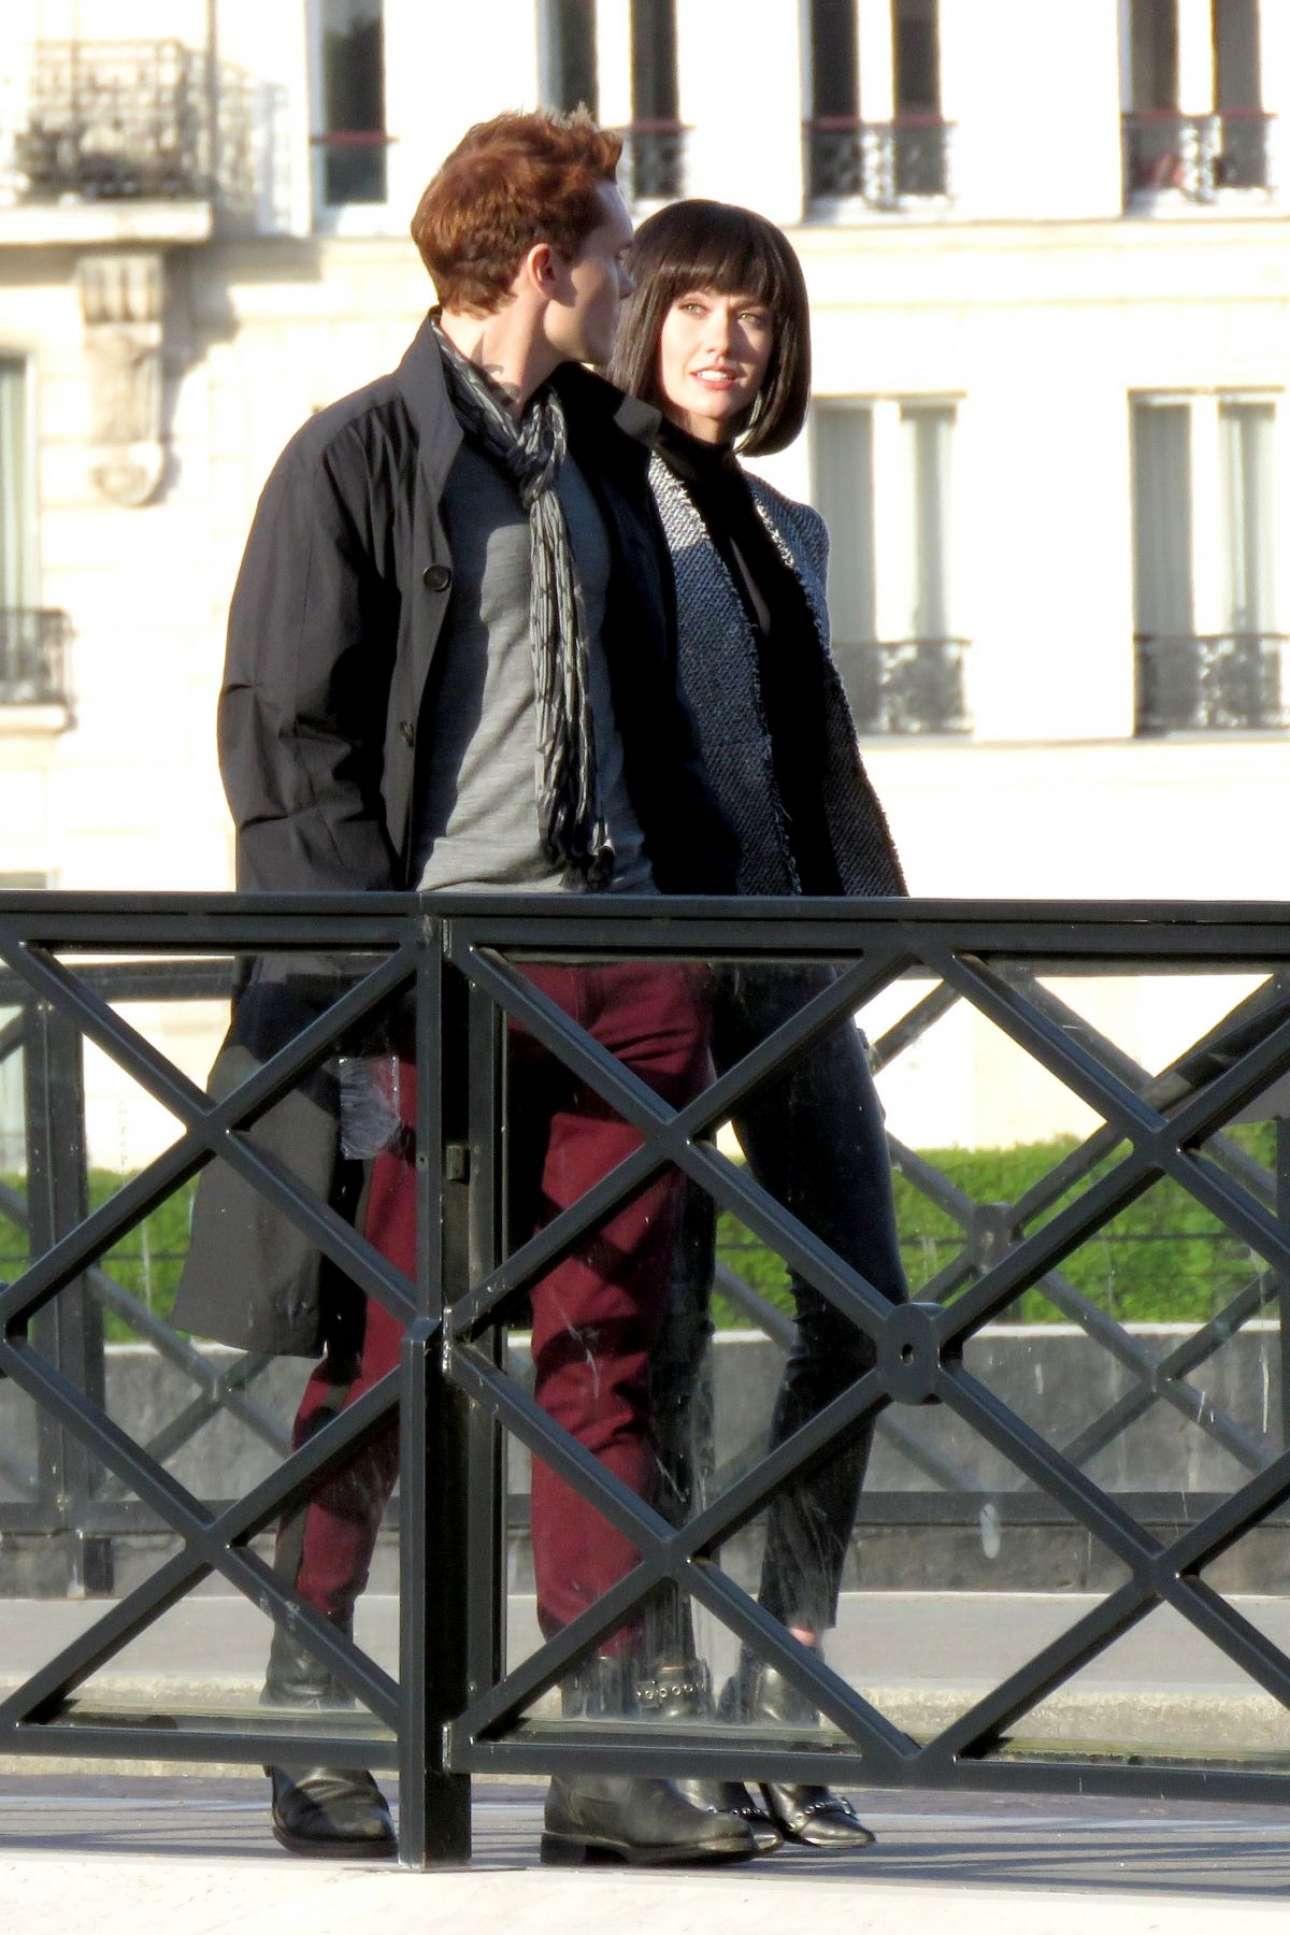 Katherine Mcnamara - Filming Of Shadowhunters - Season 3 In Paris